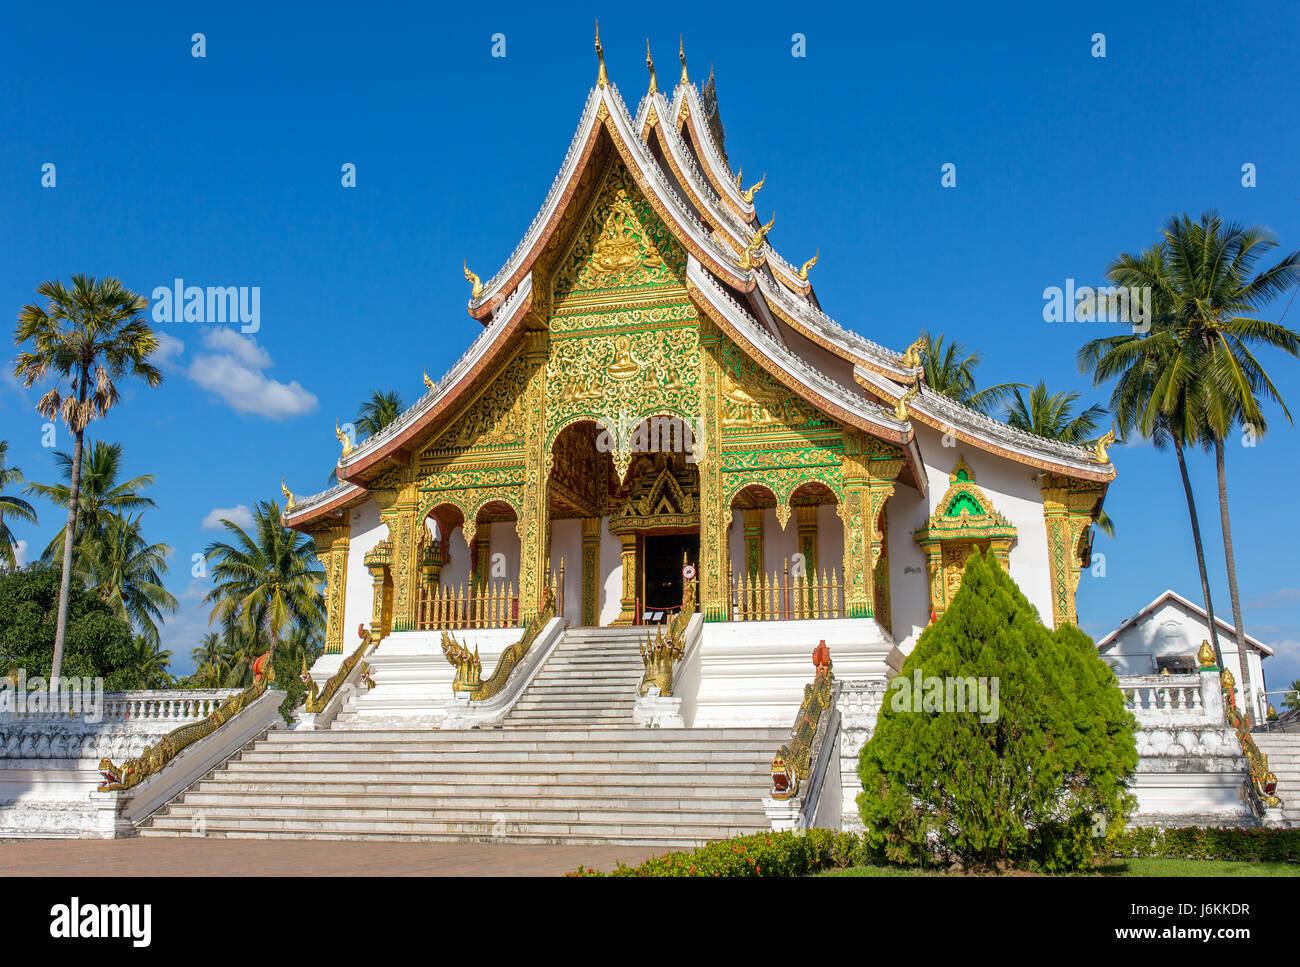 Haw Pha Bang temple in Luang Prabang, Laos Stock Photo